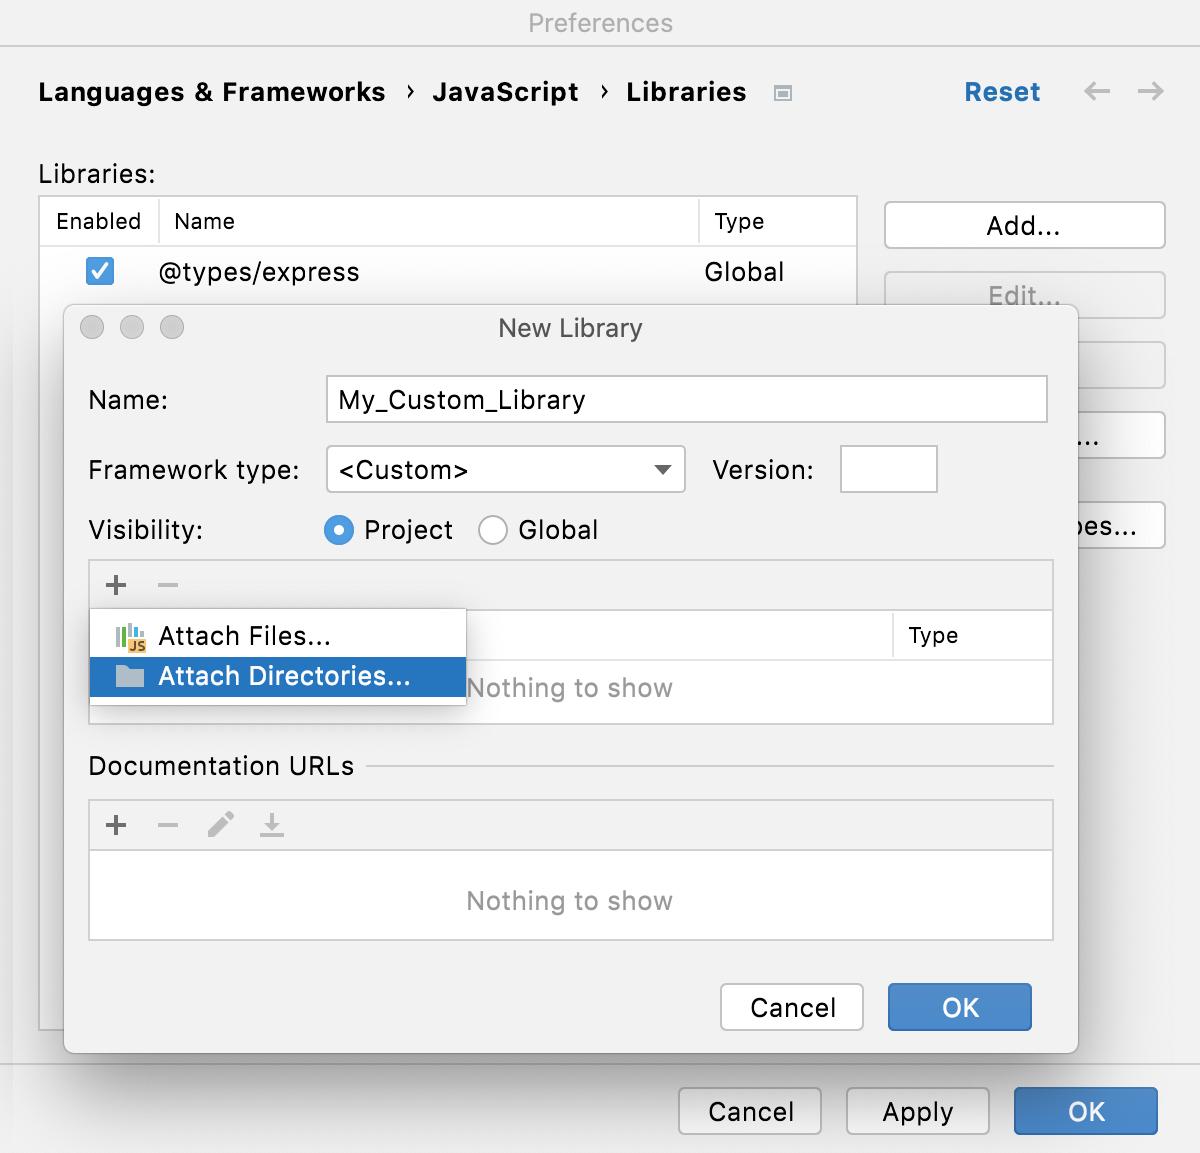 Configure custom library: Add files/folders